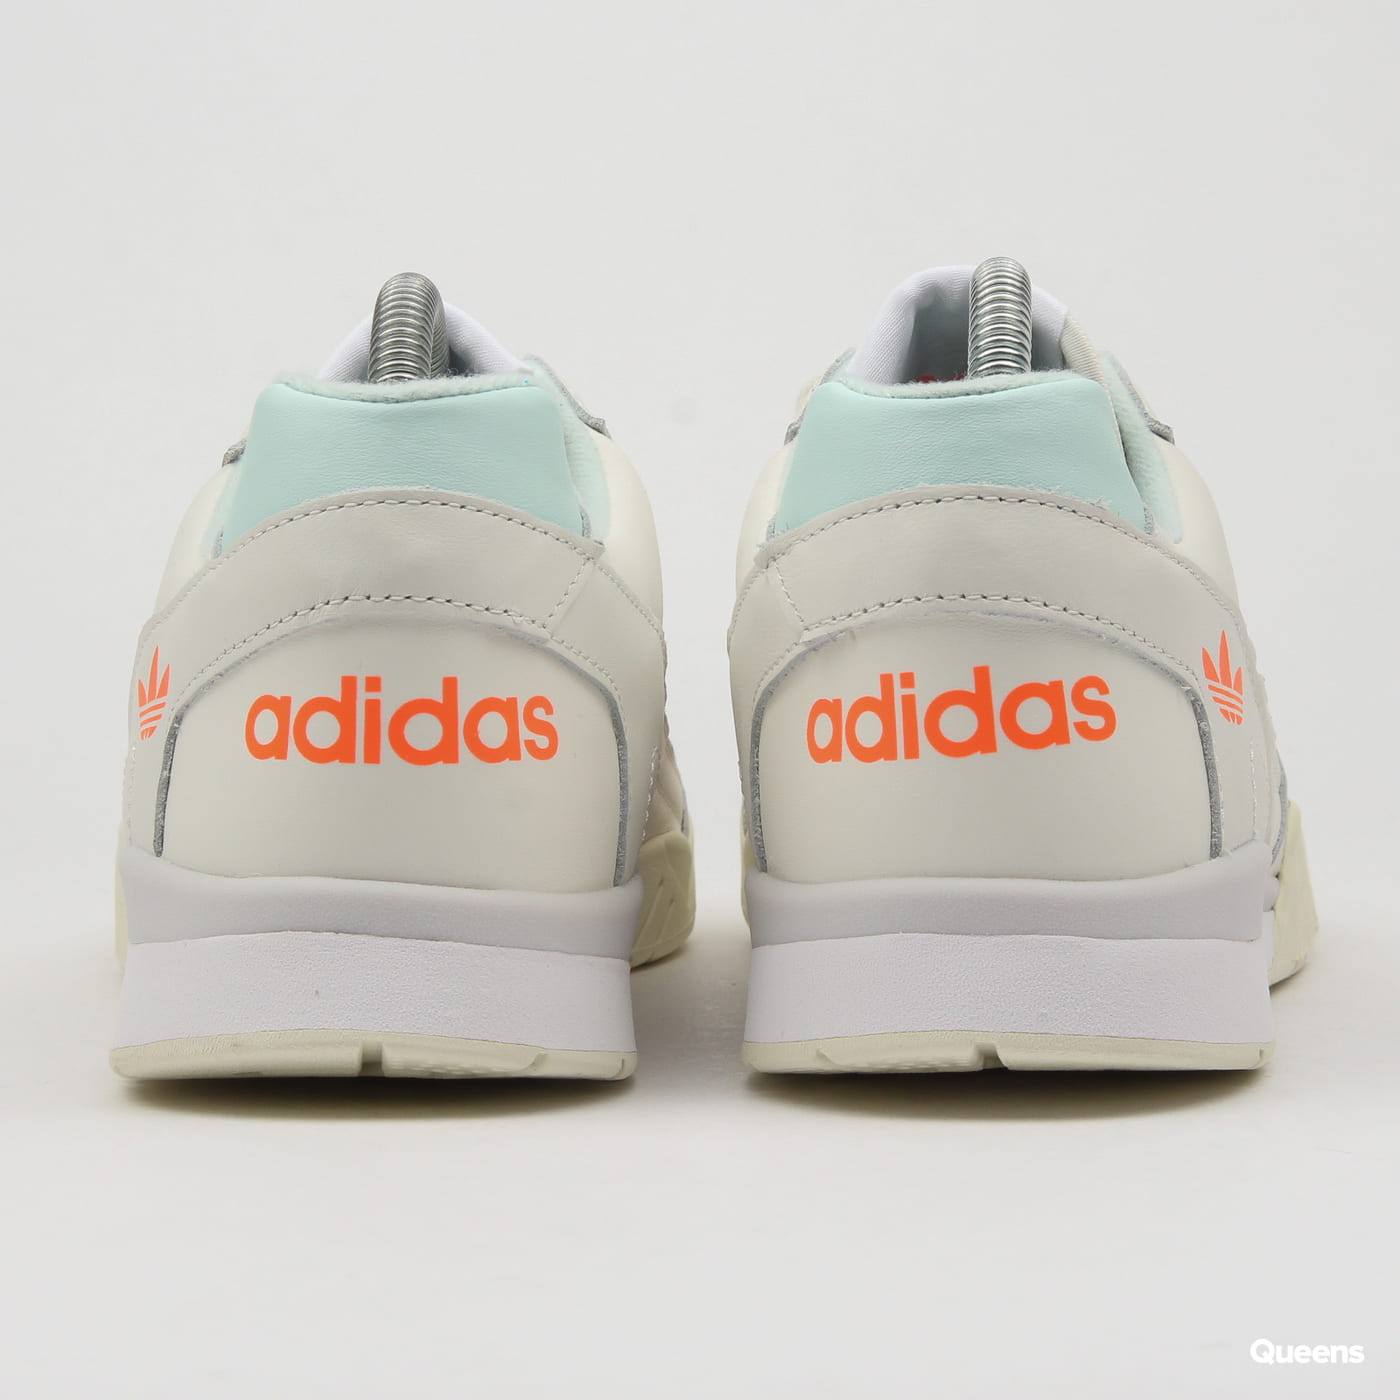 adidas Originals A.R. Trainer clowhi icemin sorang